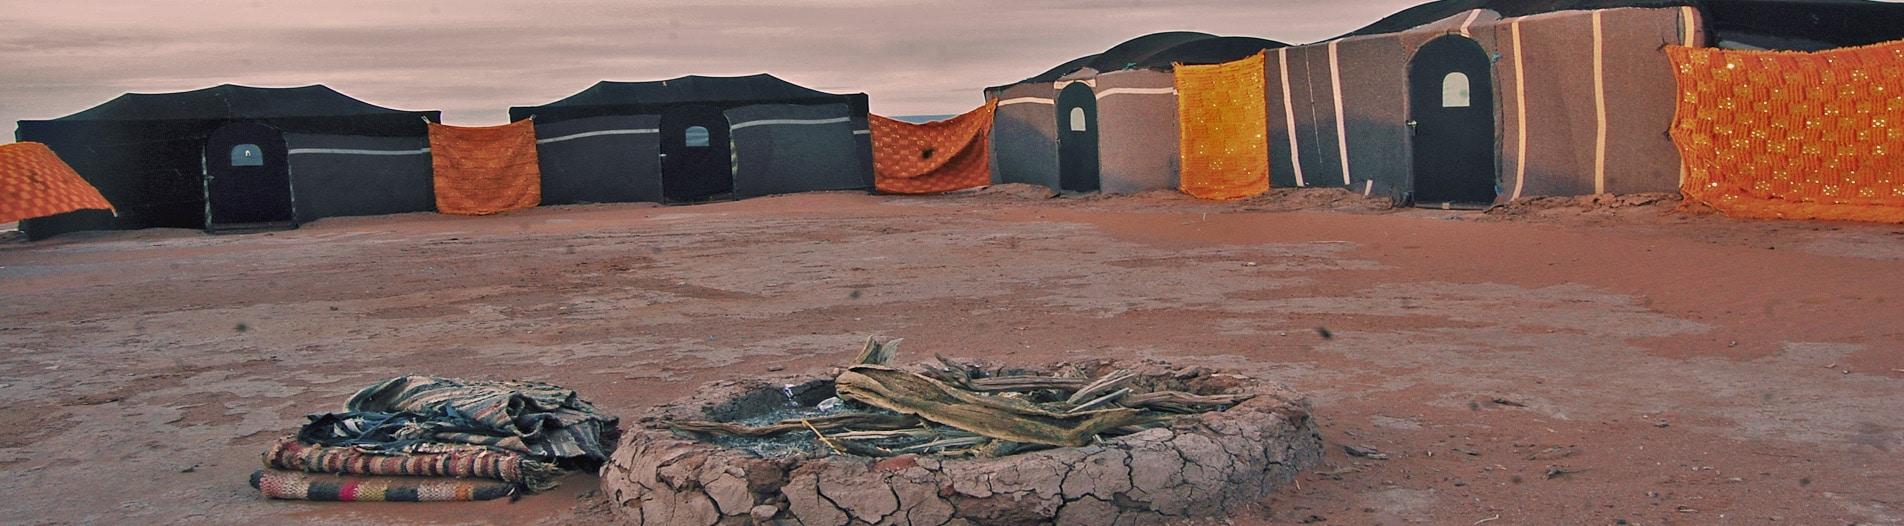 Camping Desert Sahara